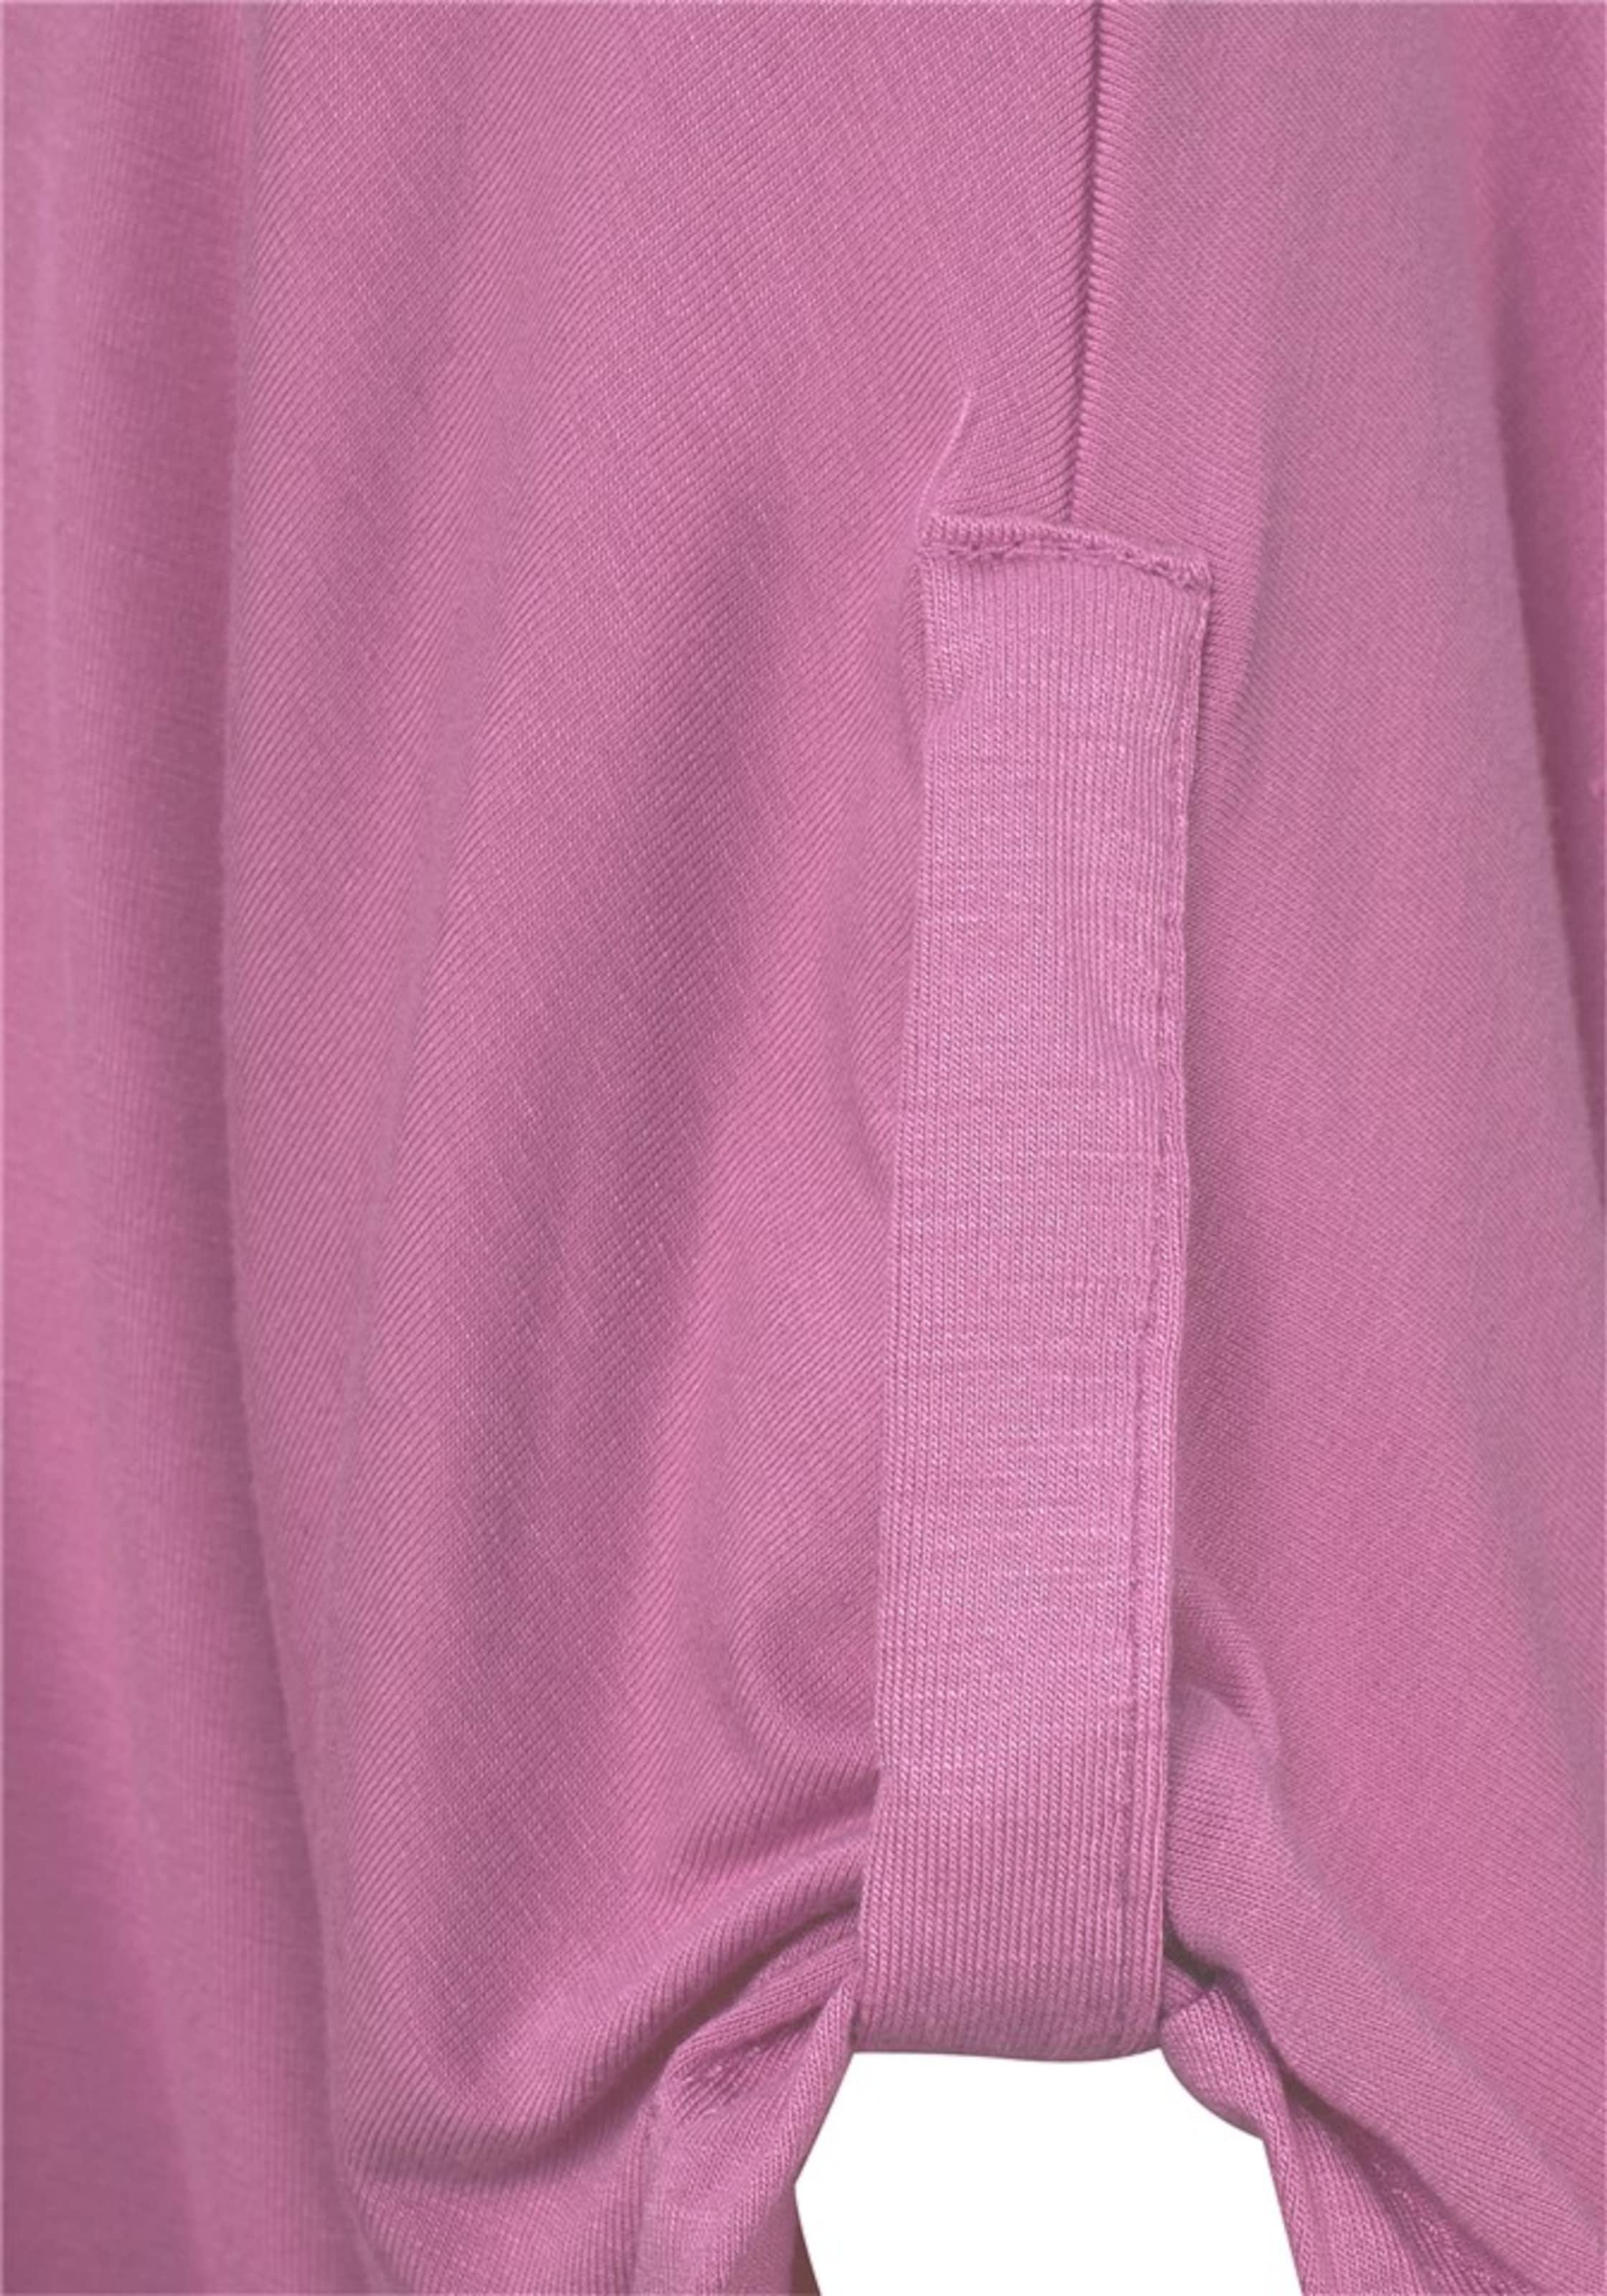 Shirt Lascana In Pitaya Lascana Shirt QtrdCsh